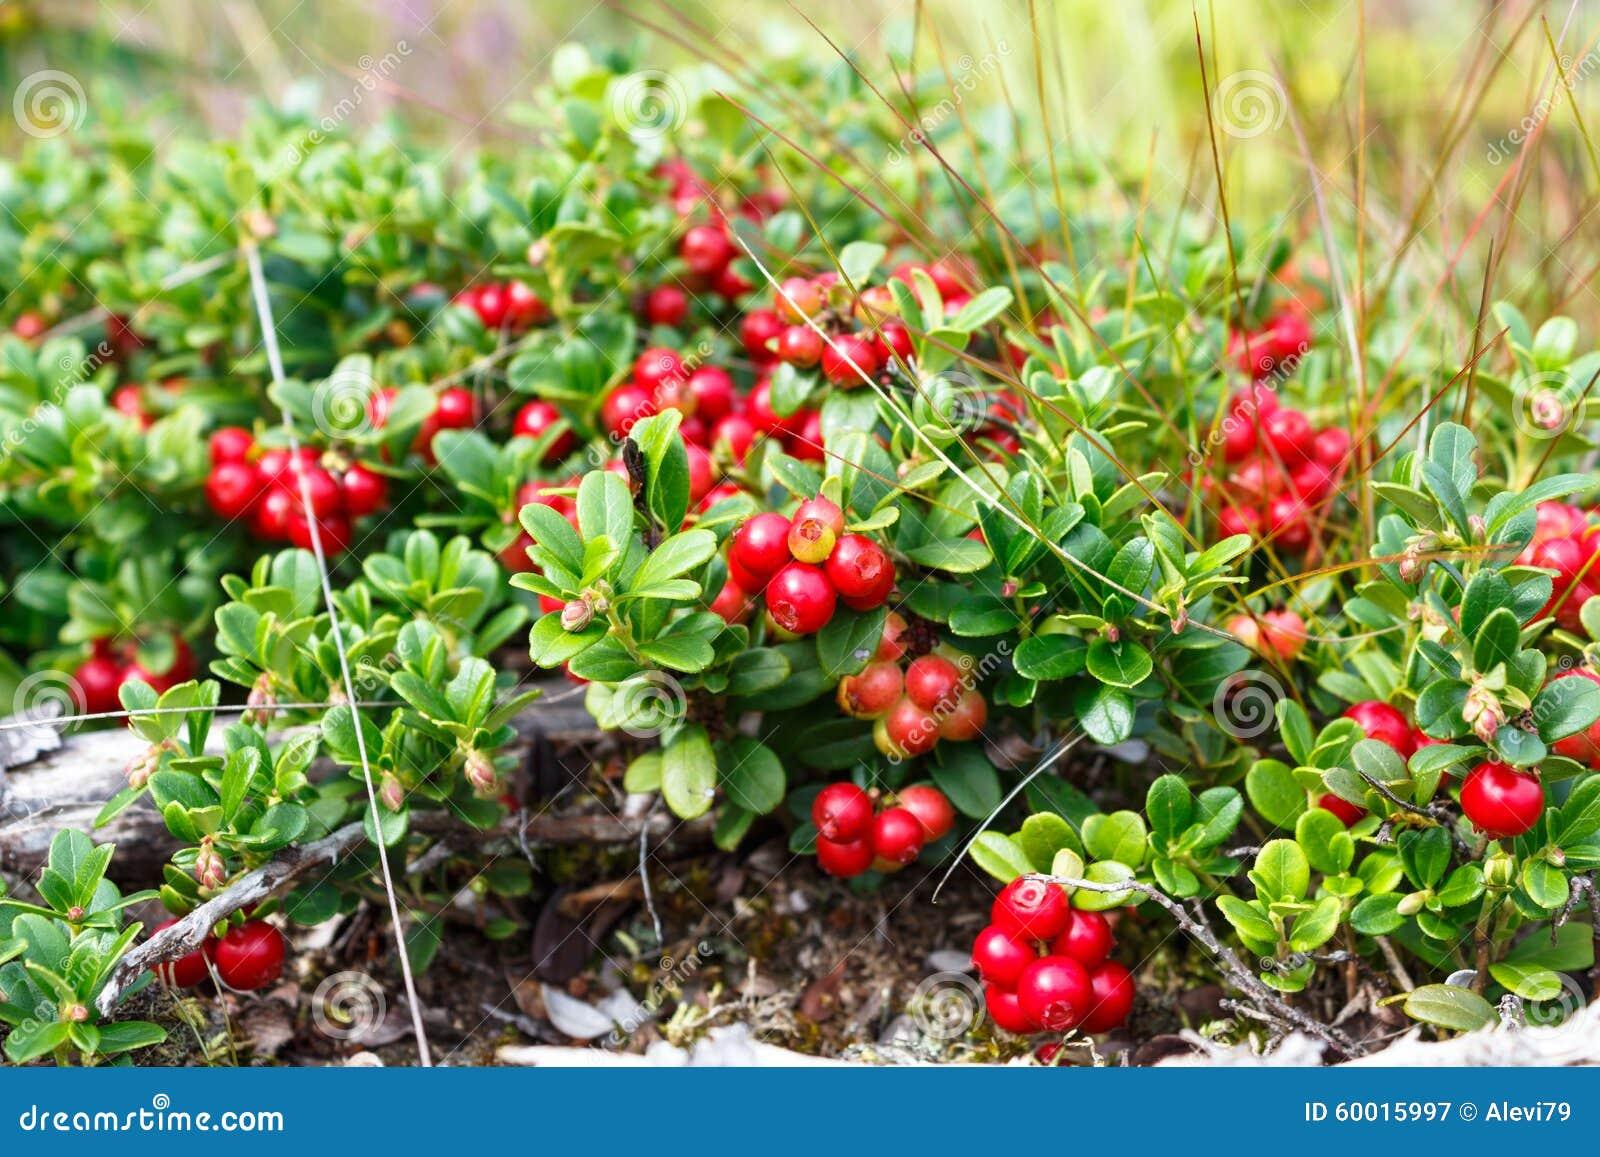 patulent lingonberry bush stock image image of green 60015997. Black Bedroom Furniture Sets. Home Design Ideas